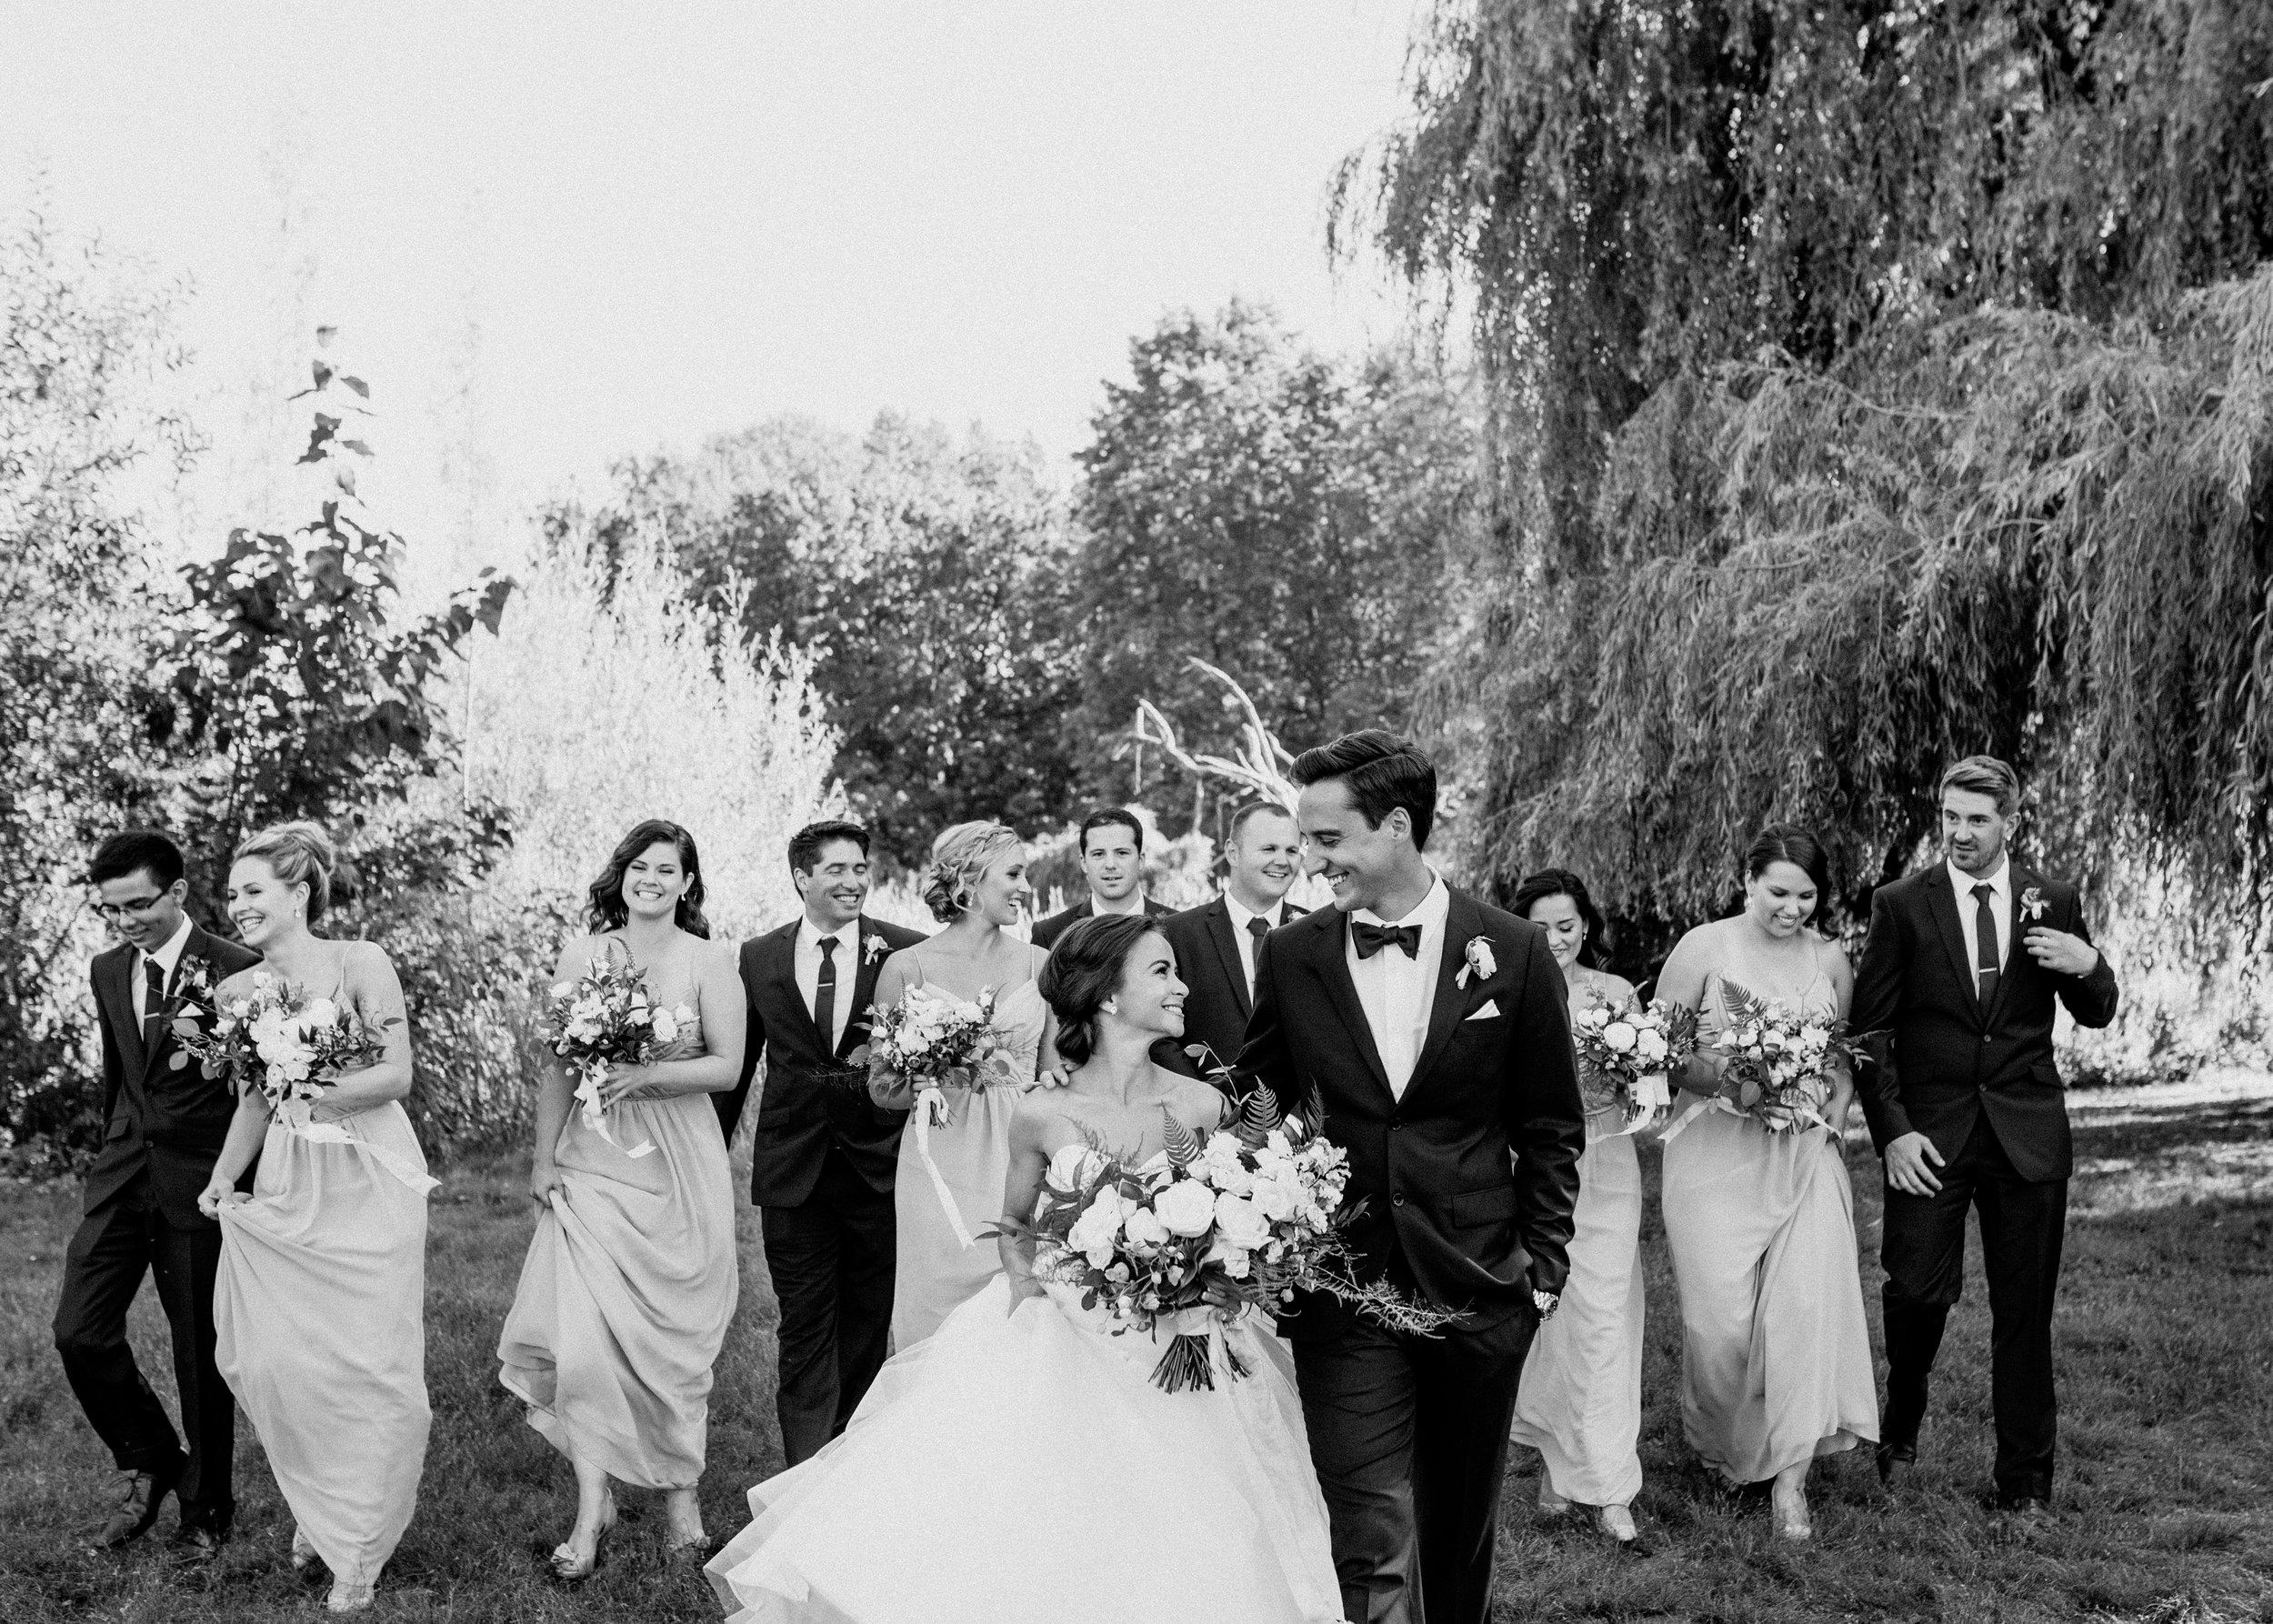 herafilms_carlotta_alex_wedding_hera_highres-31.jpg